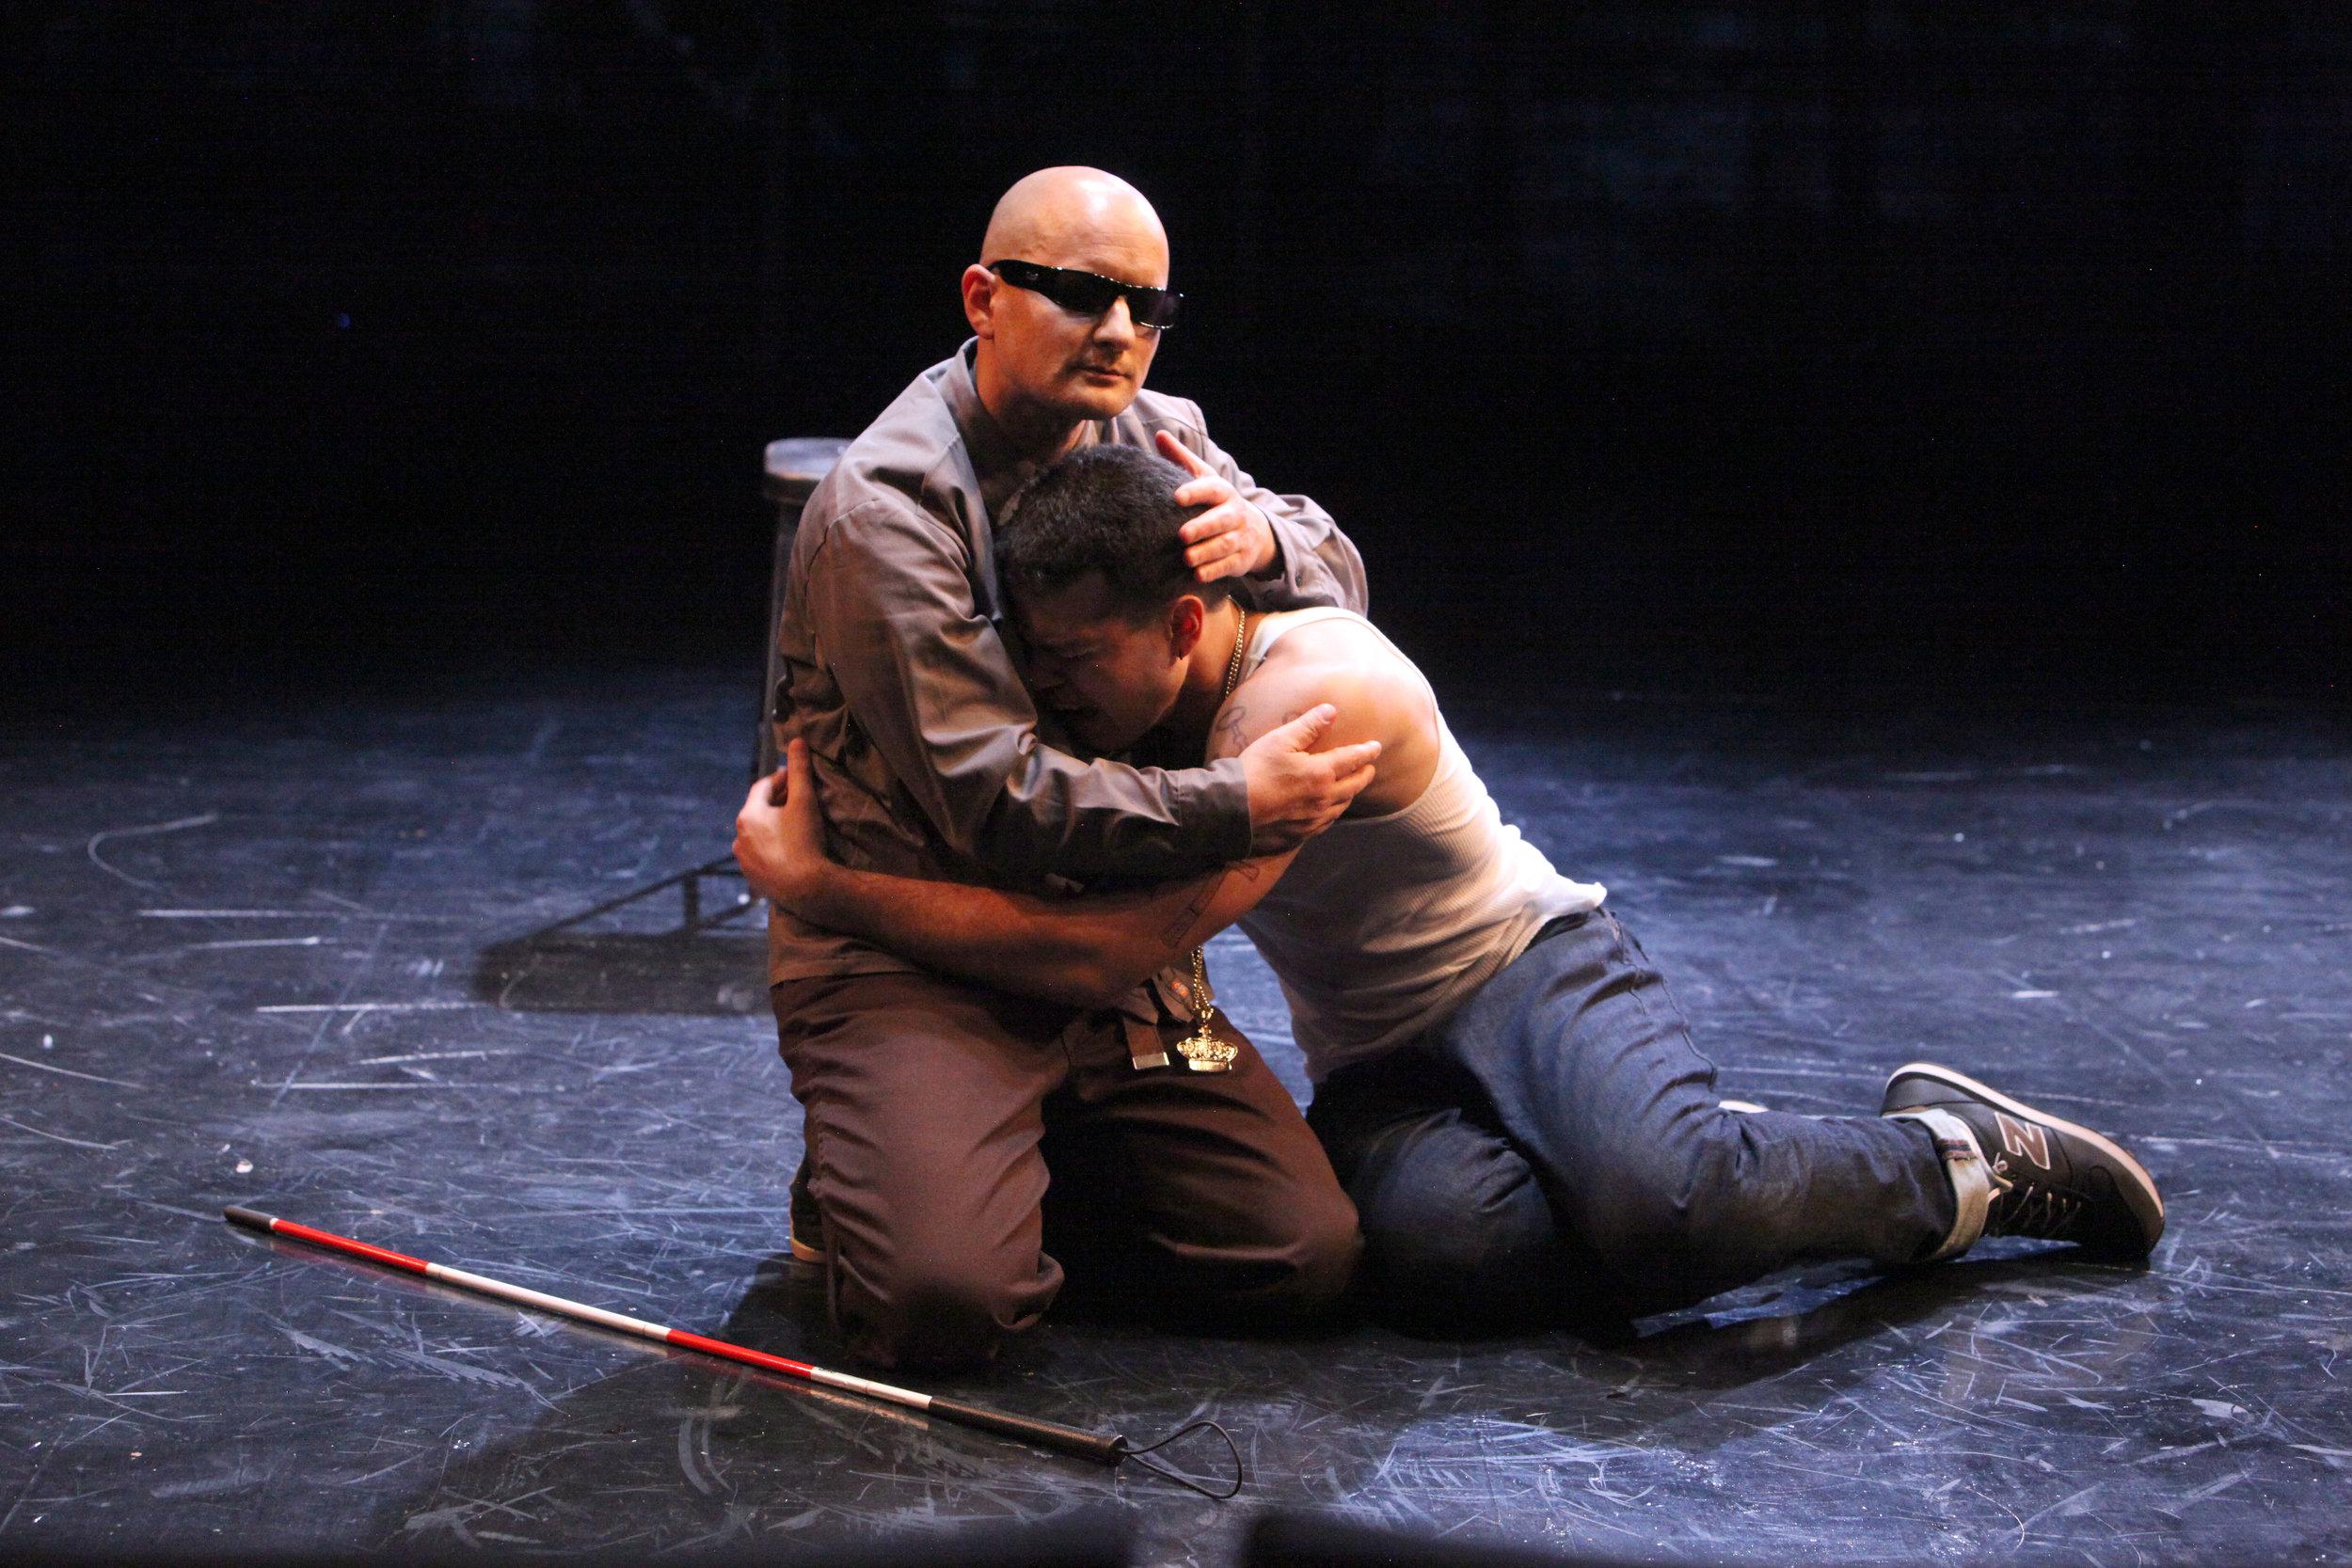 Tirésias (Sean San José) and his foster son Oedipus (Esteban Carmona). Photo by Jennifer Reiley.